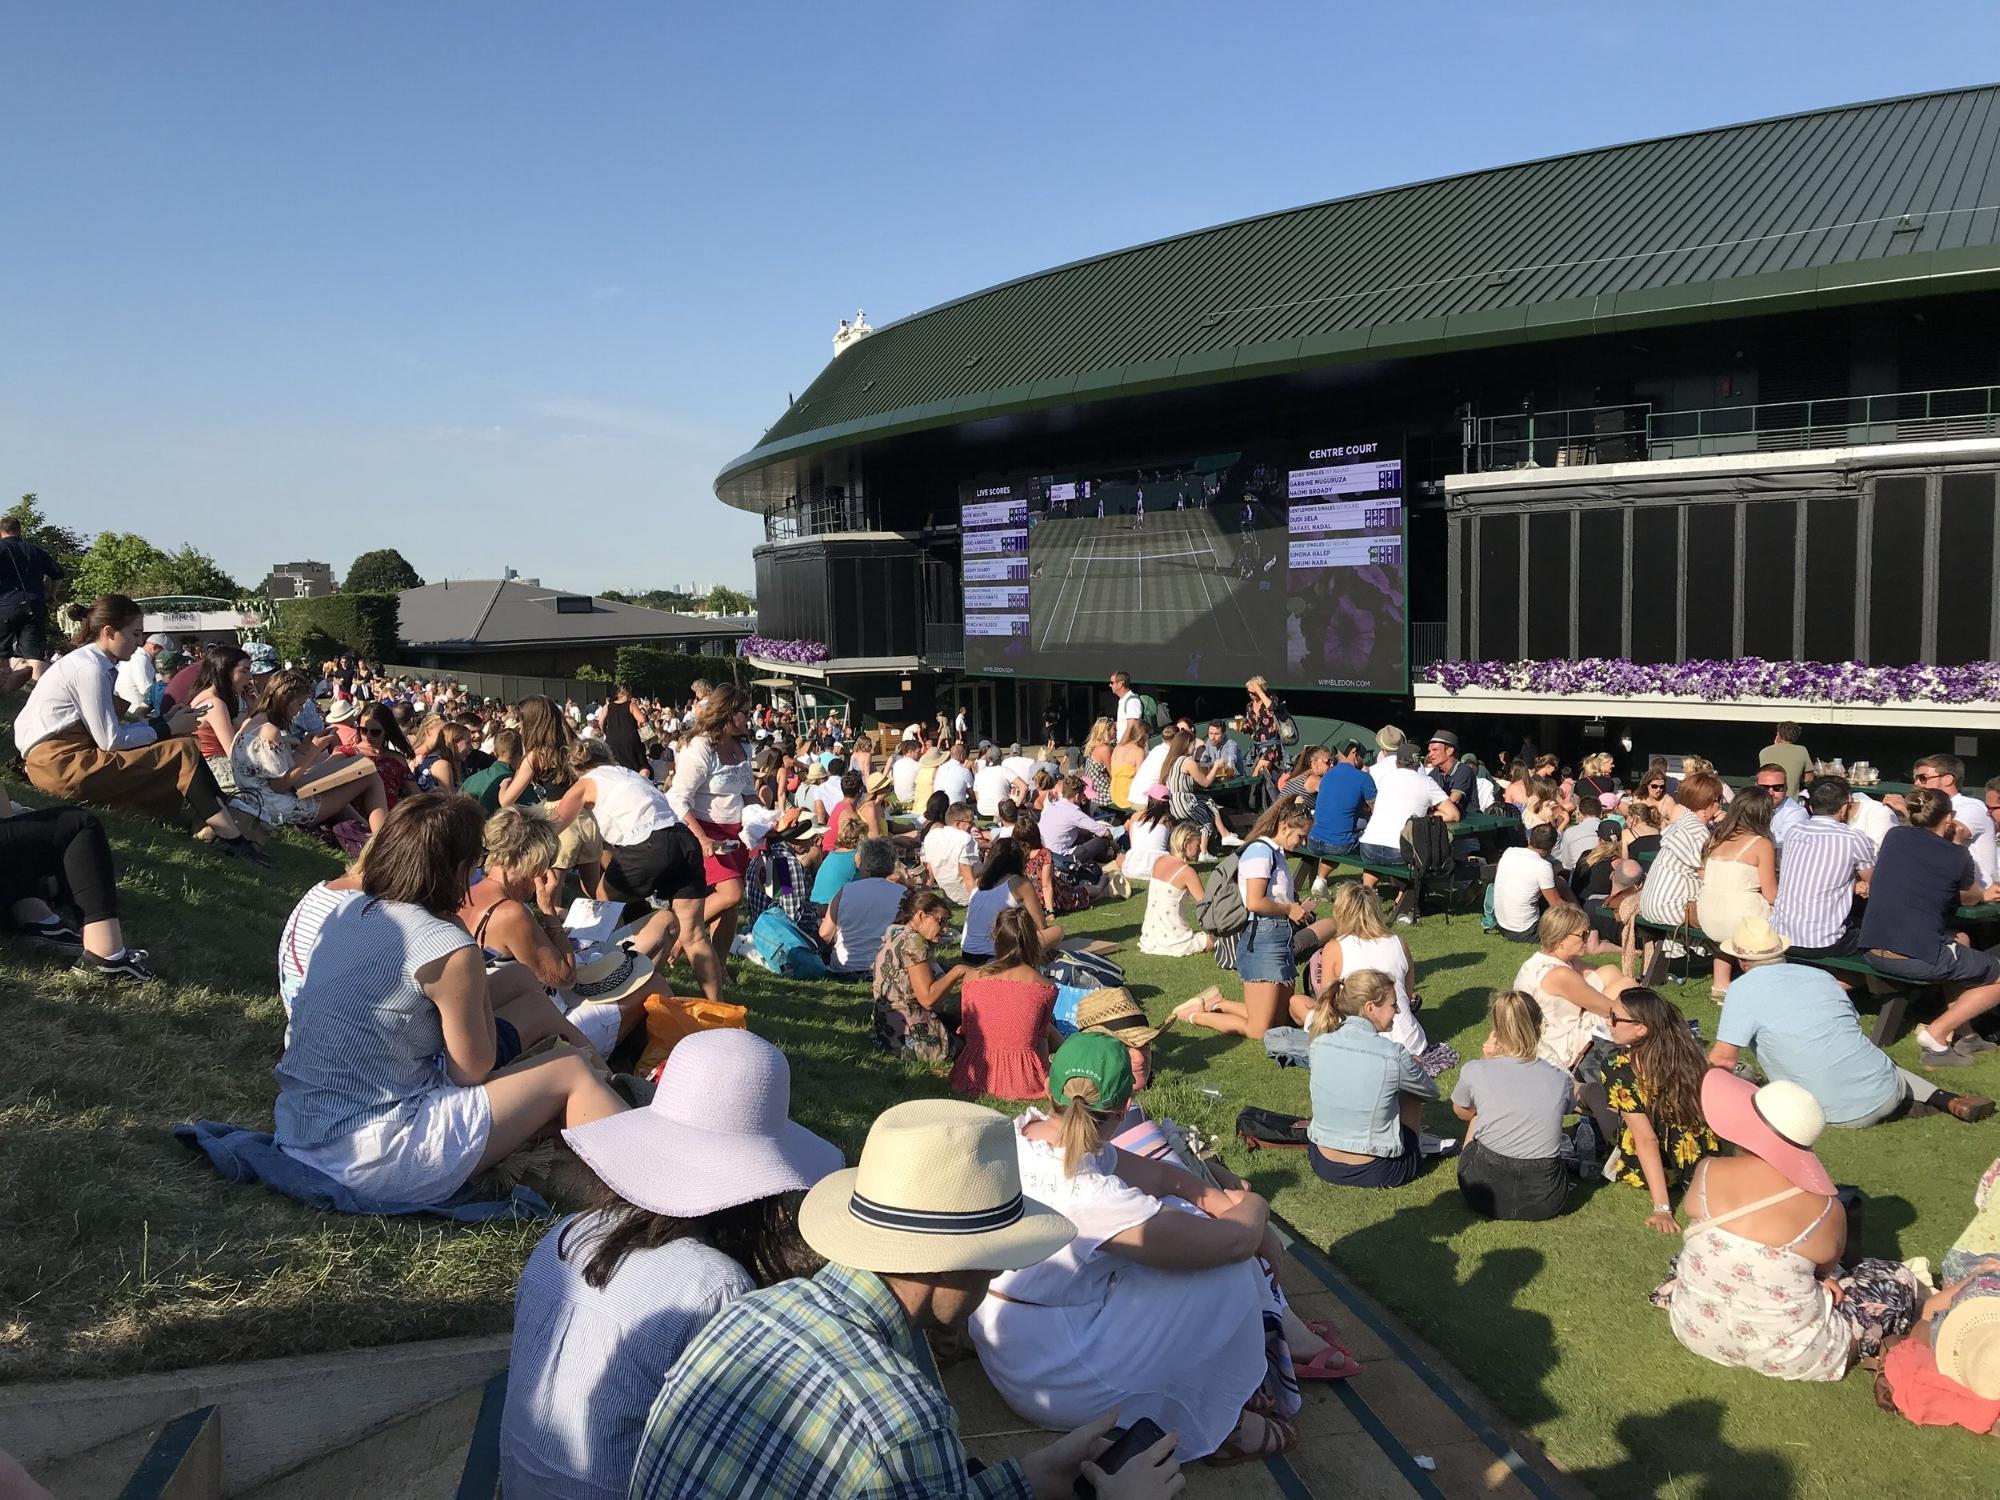 Sitting on the Wimbledon Lawn